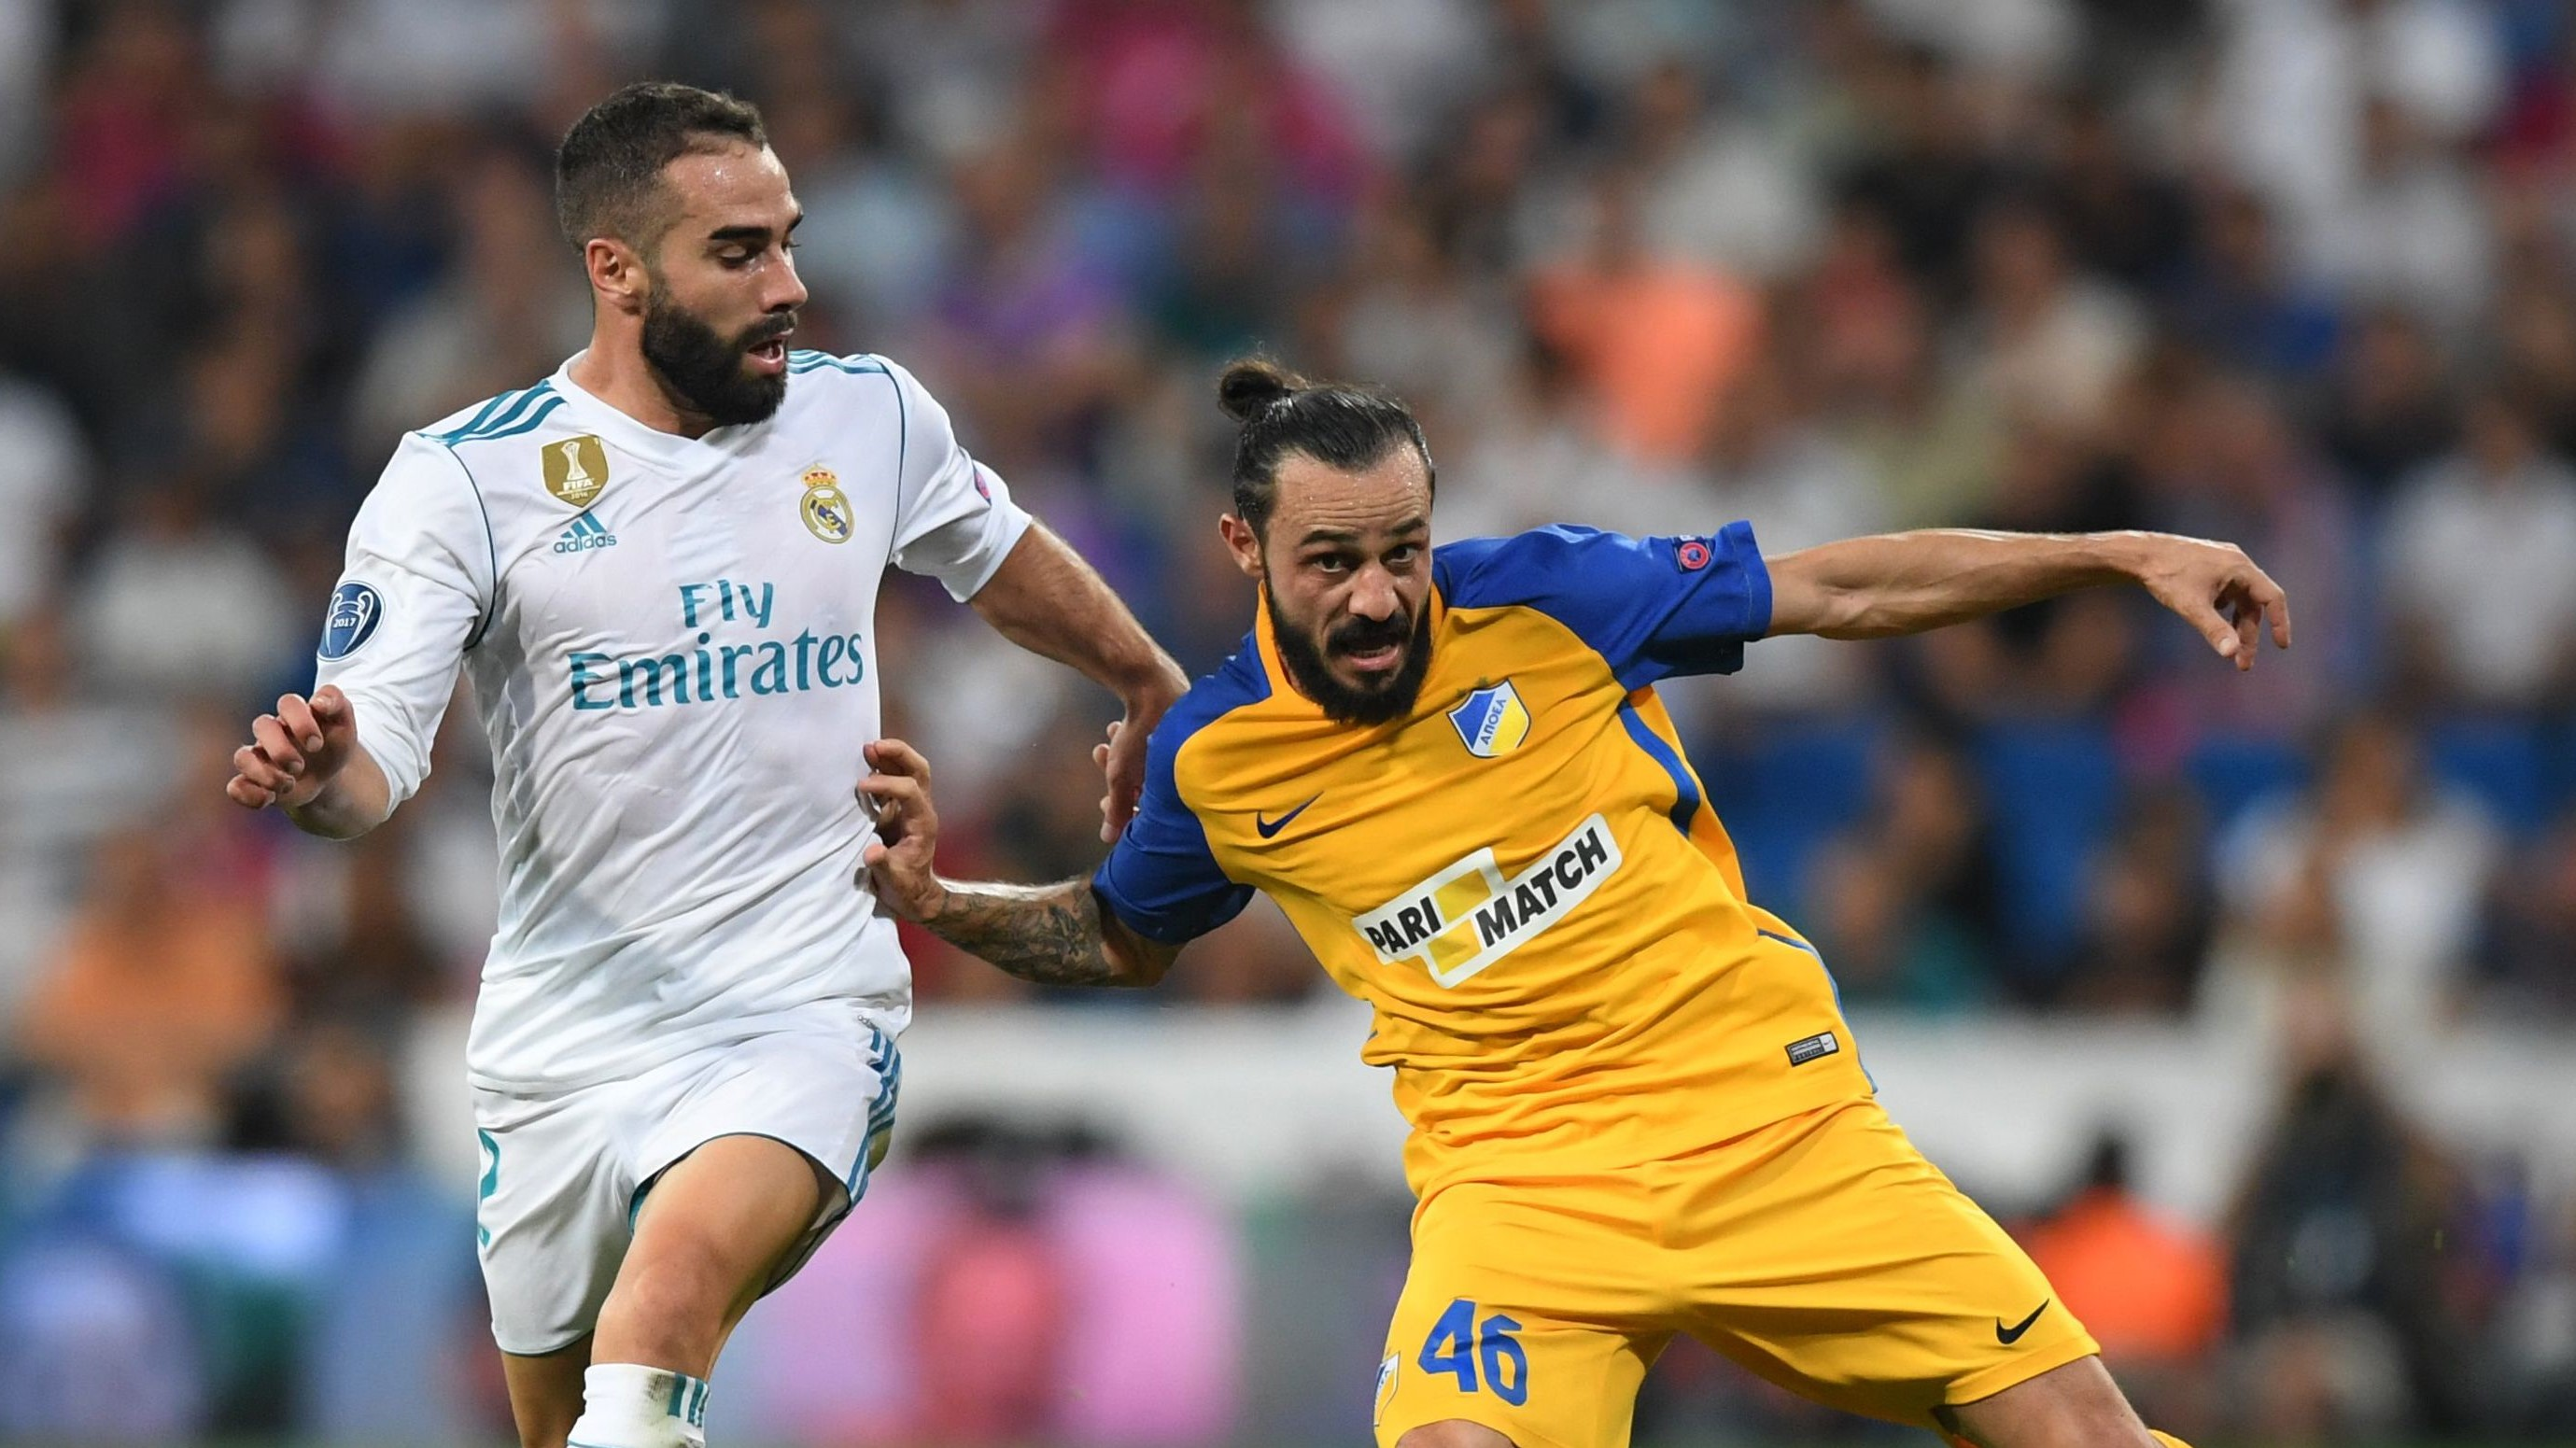 Dani Carvajal Stathis Aloneftis Real Madrid APOEL Champions League 13092017